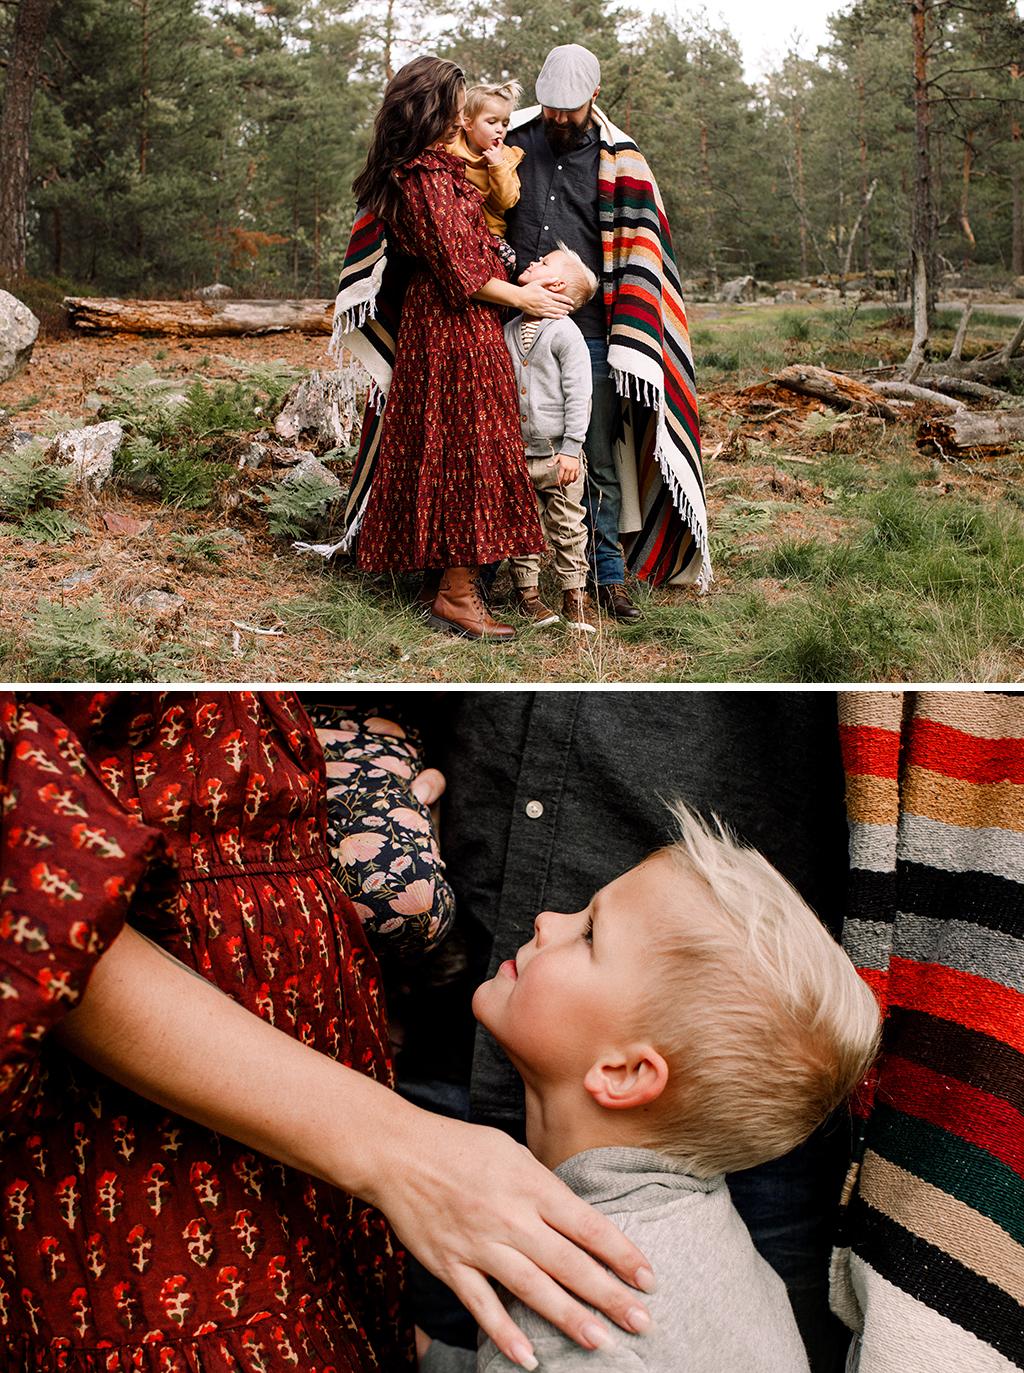 Hostfotografering_familjefotograf_Stockholm_Anna_Sandstrom_5.jpg